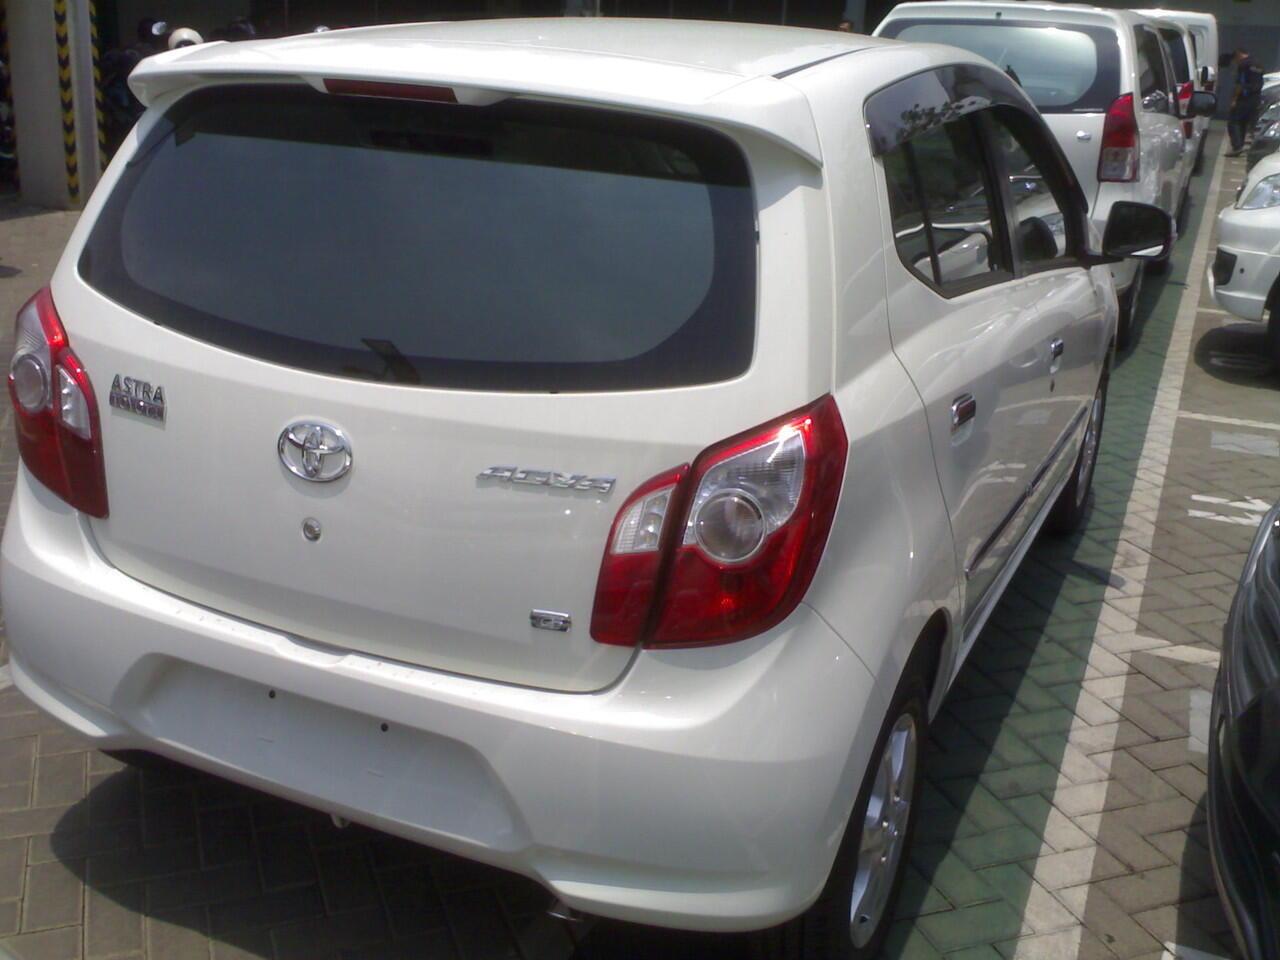 Terjual Toyota Agya Cirebon Dp 26 000 000 Angsuran 2 000 000 5